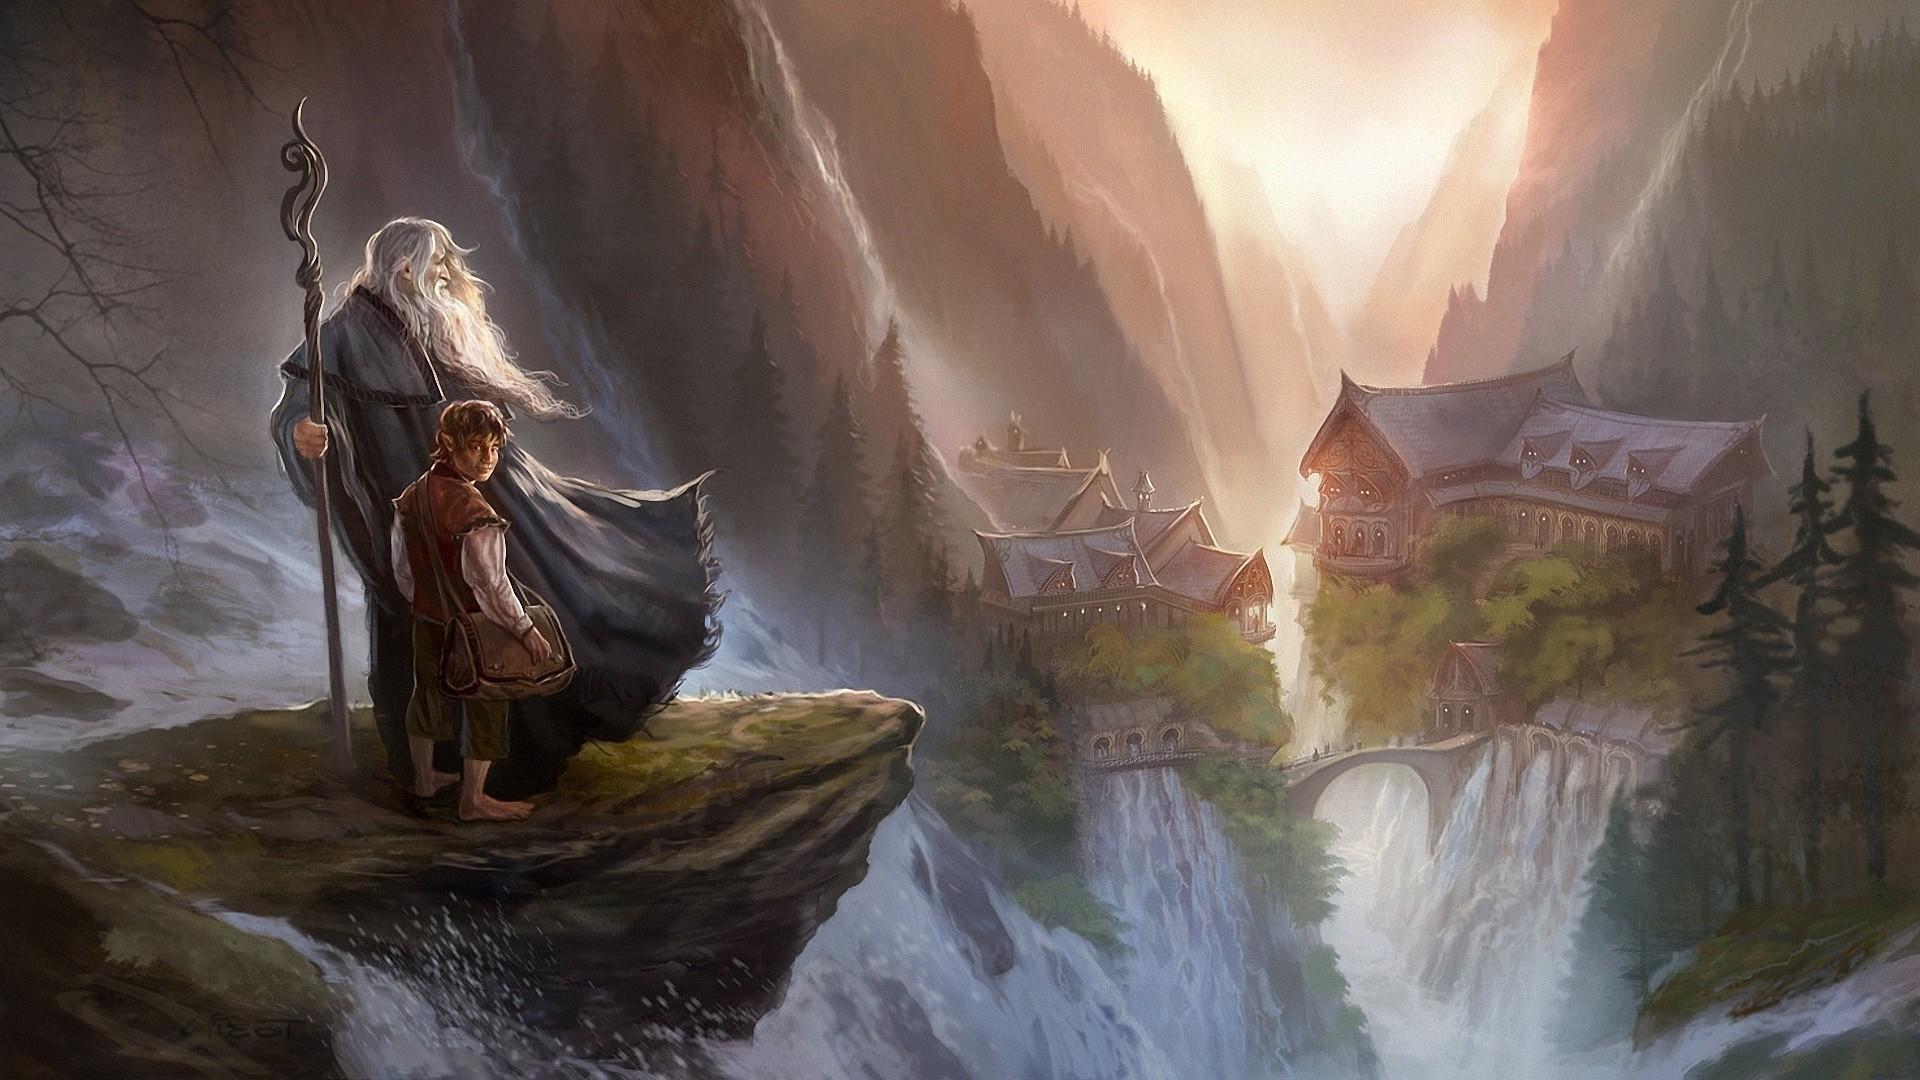 Wallpaper 1920x1080 Px Gandalf Imladris Rivendell The